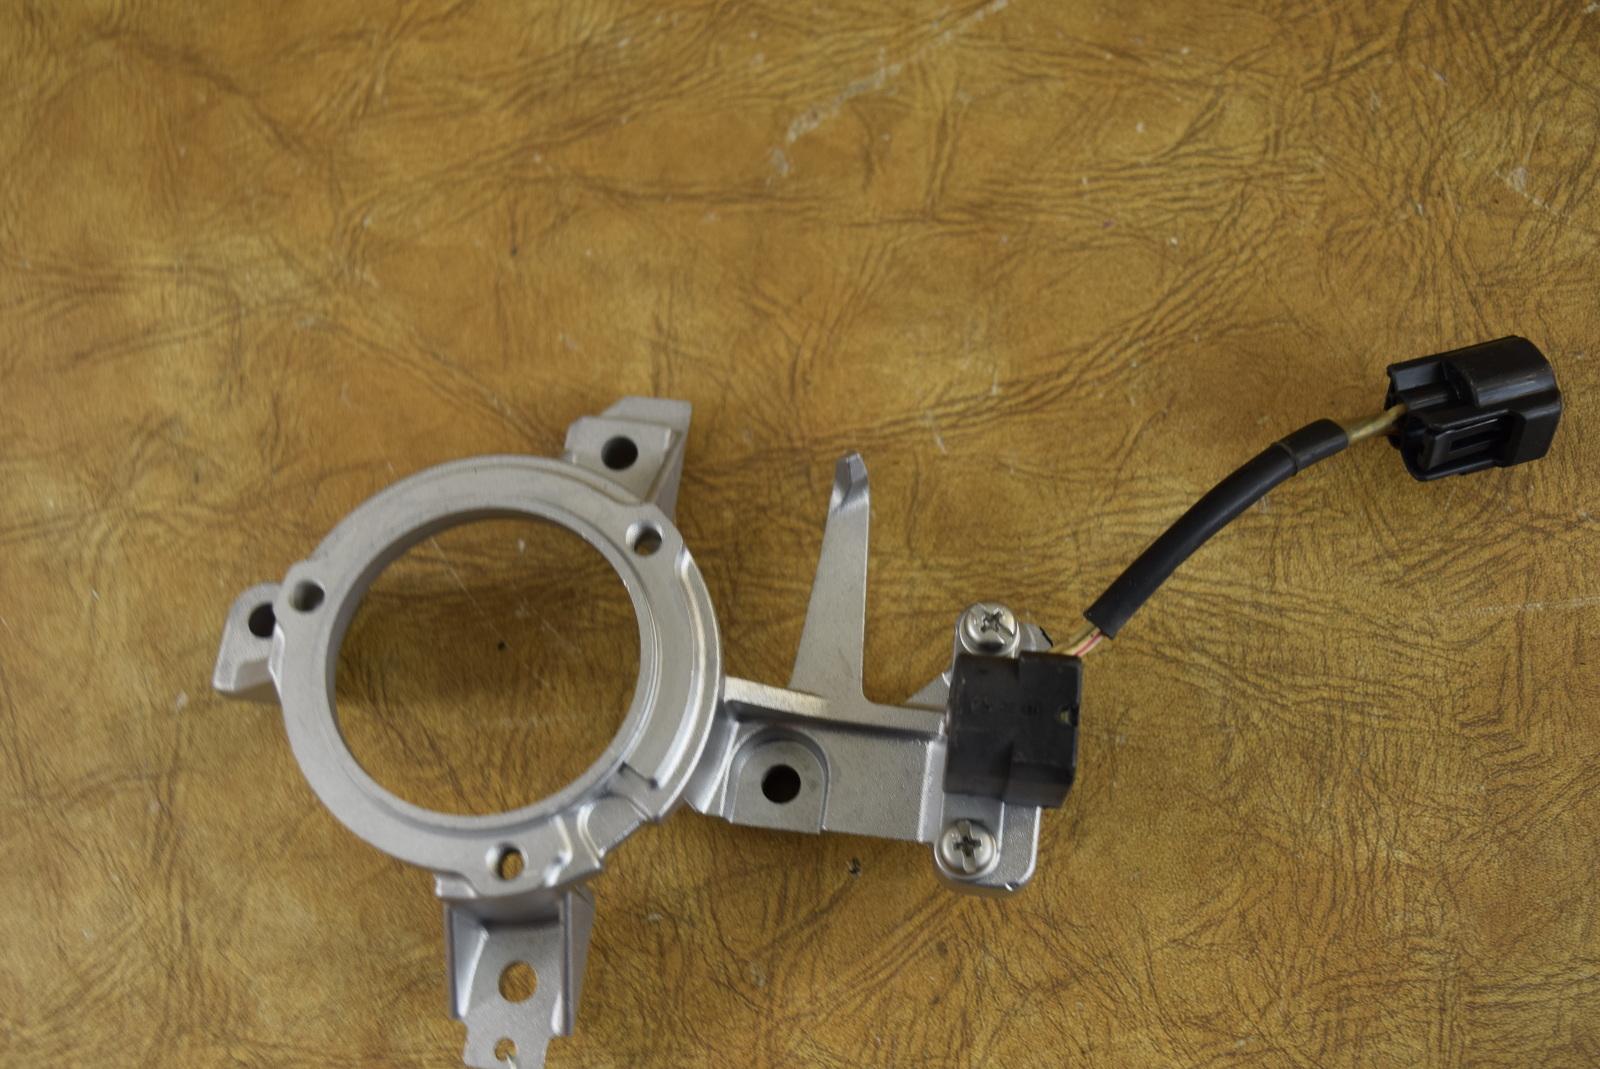 Yamaha magneto base 62y 85561 00 94 1995 2004 40 50 60 hp for Yamaha 50 hp 4 stroke parts